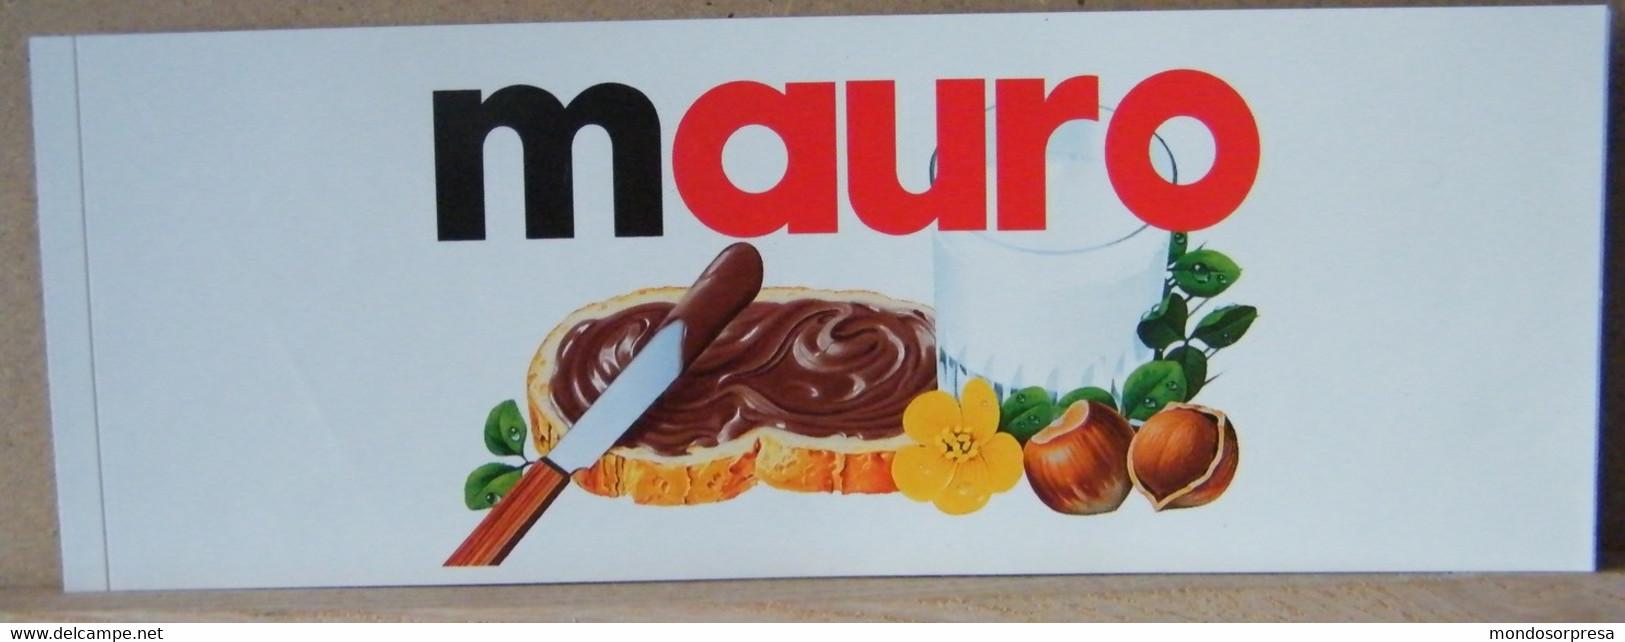 MONDOSORPRESA, ADESIVI NUTELLA NOMI, MAURO - Nutella